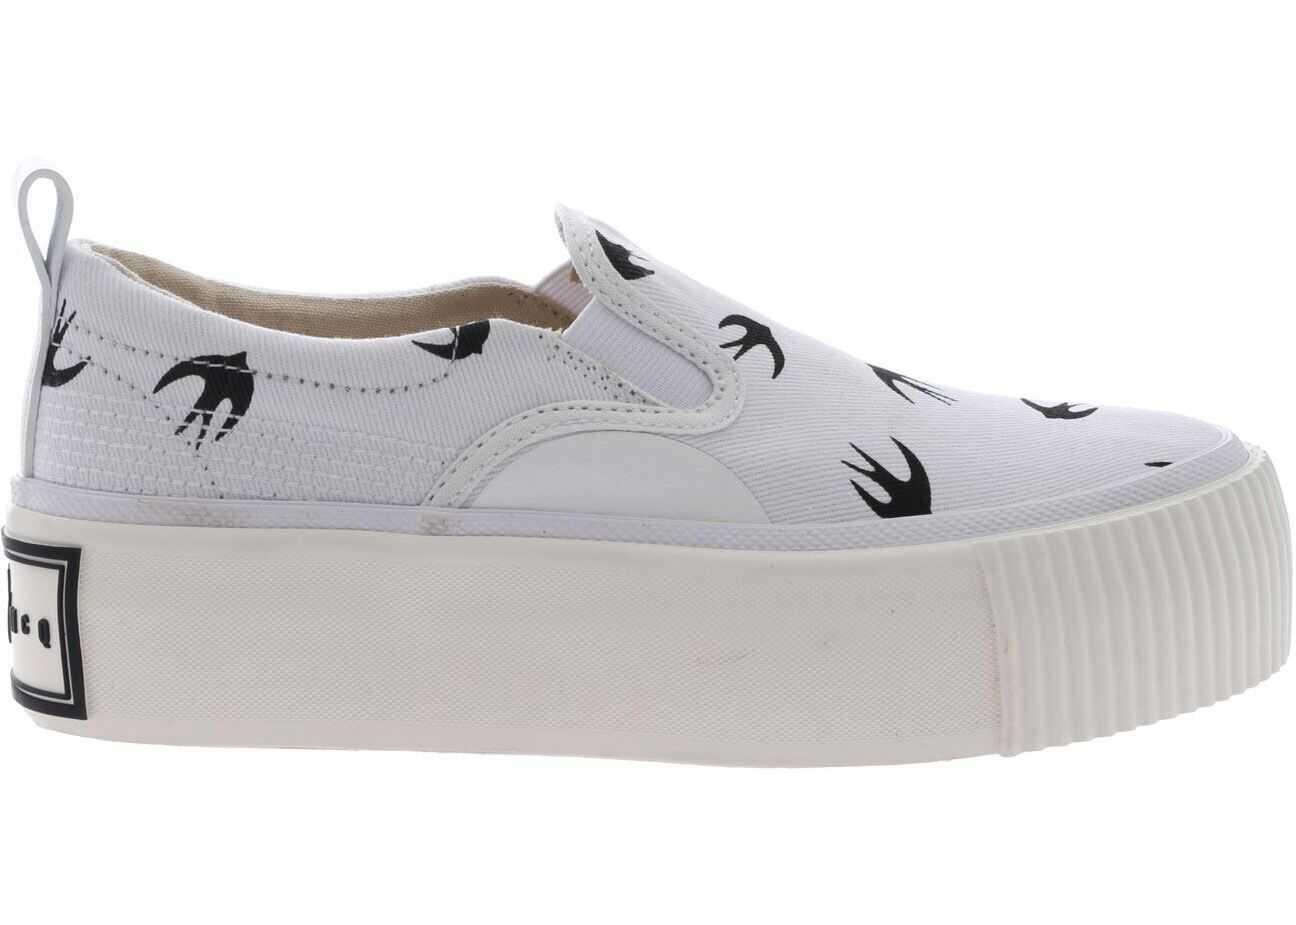 MCQ Alexander McQueen White Plimsoll Slip On 545107 R2570 9024 White imagine b-mall.ro